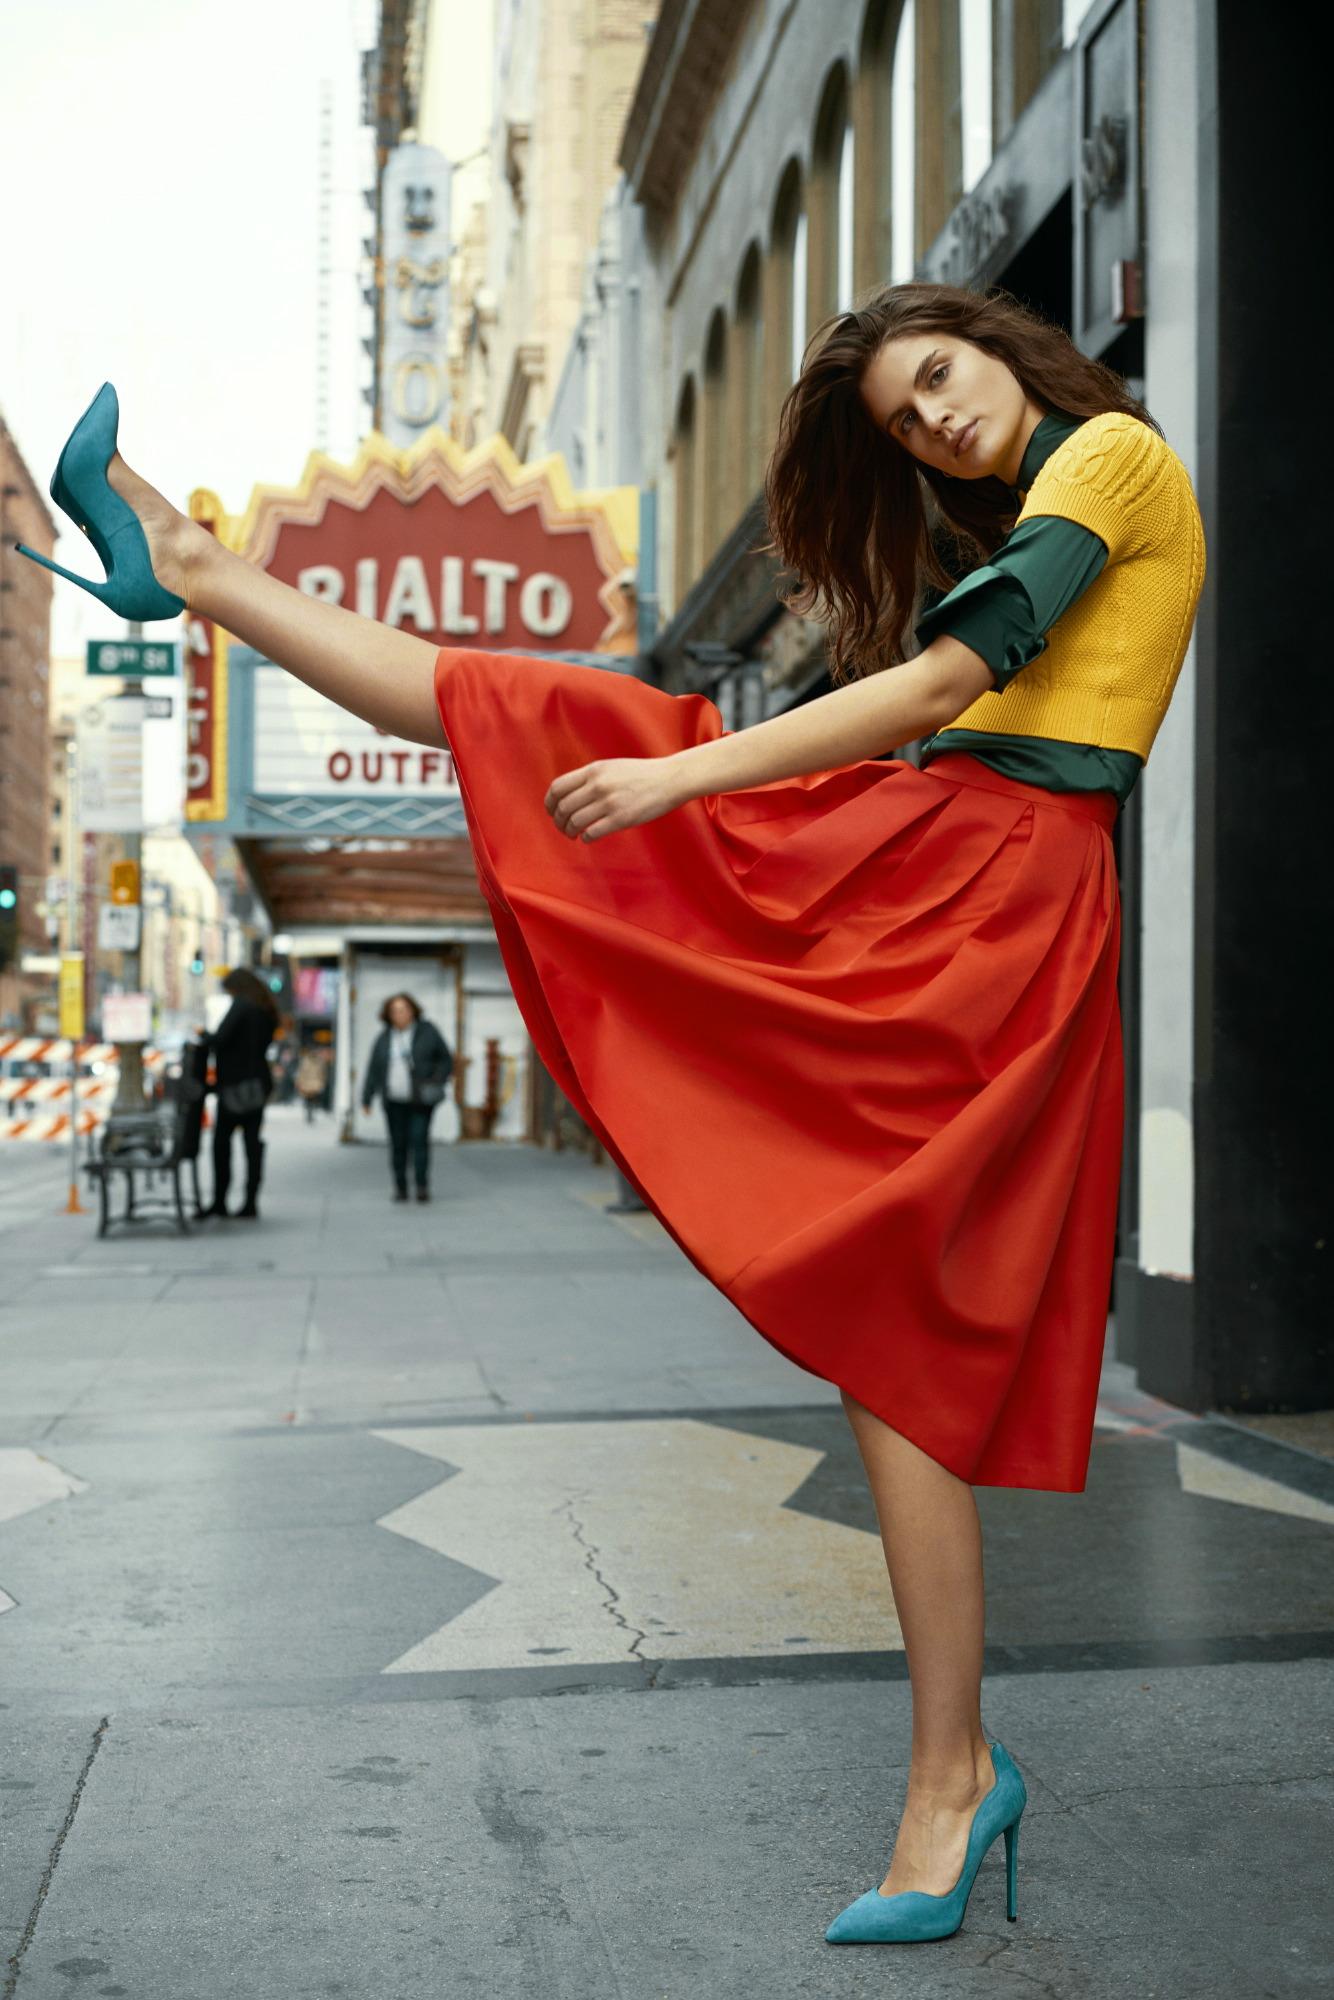 fashion_editorial_photography_curtet_066